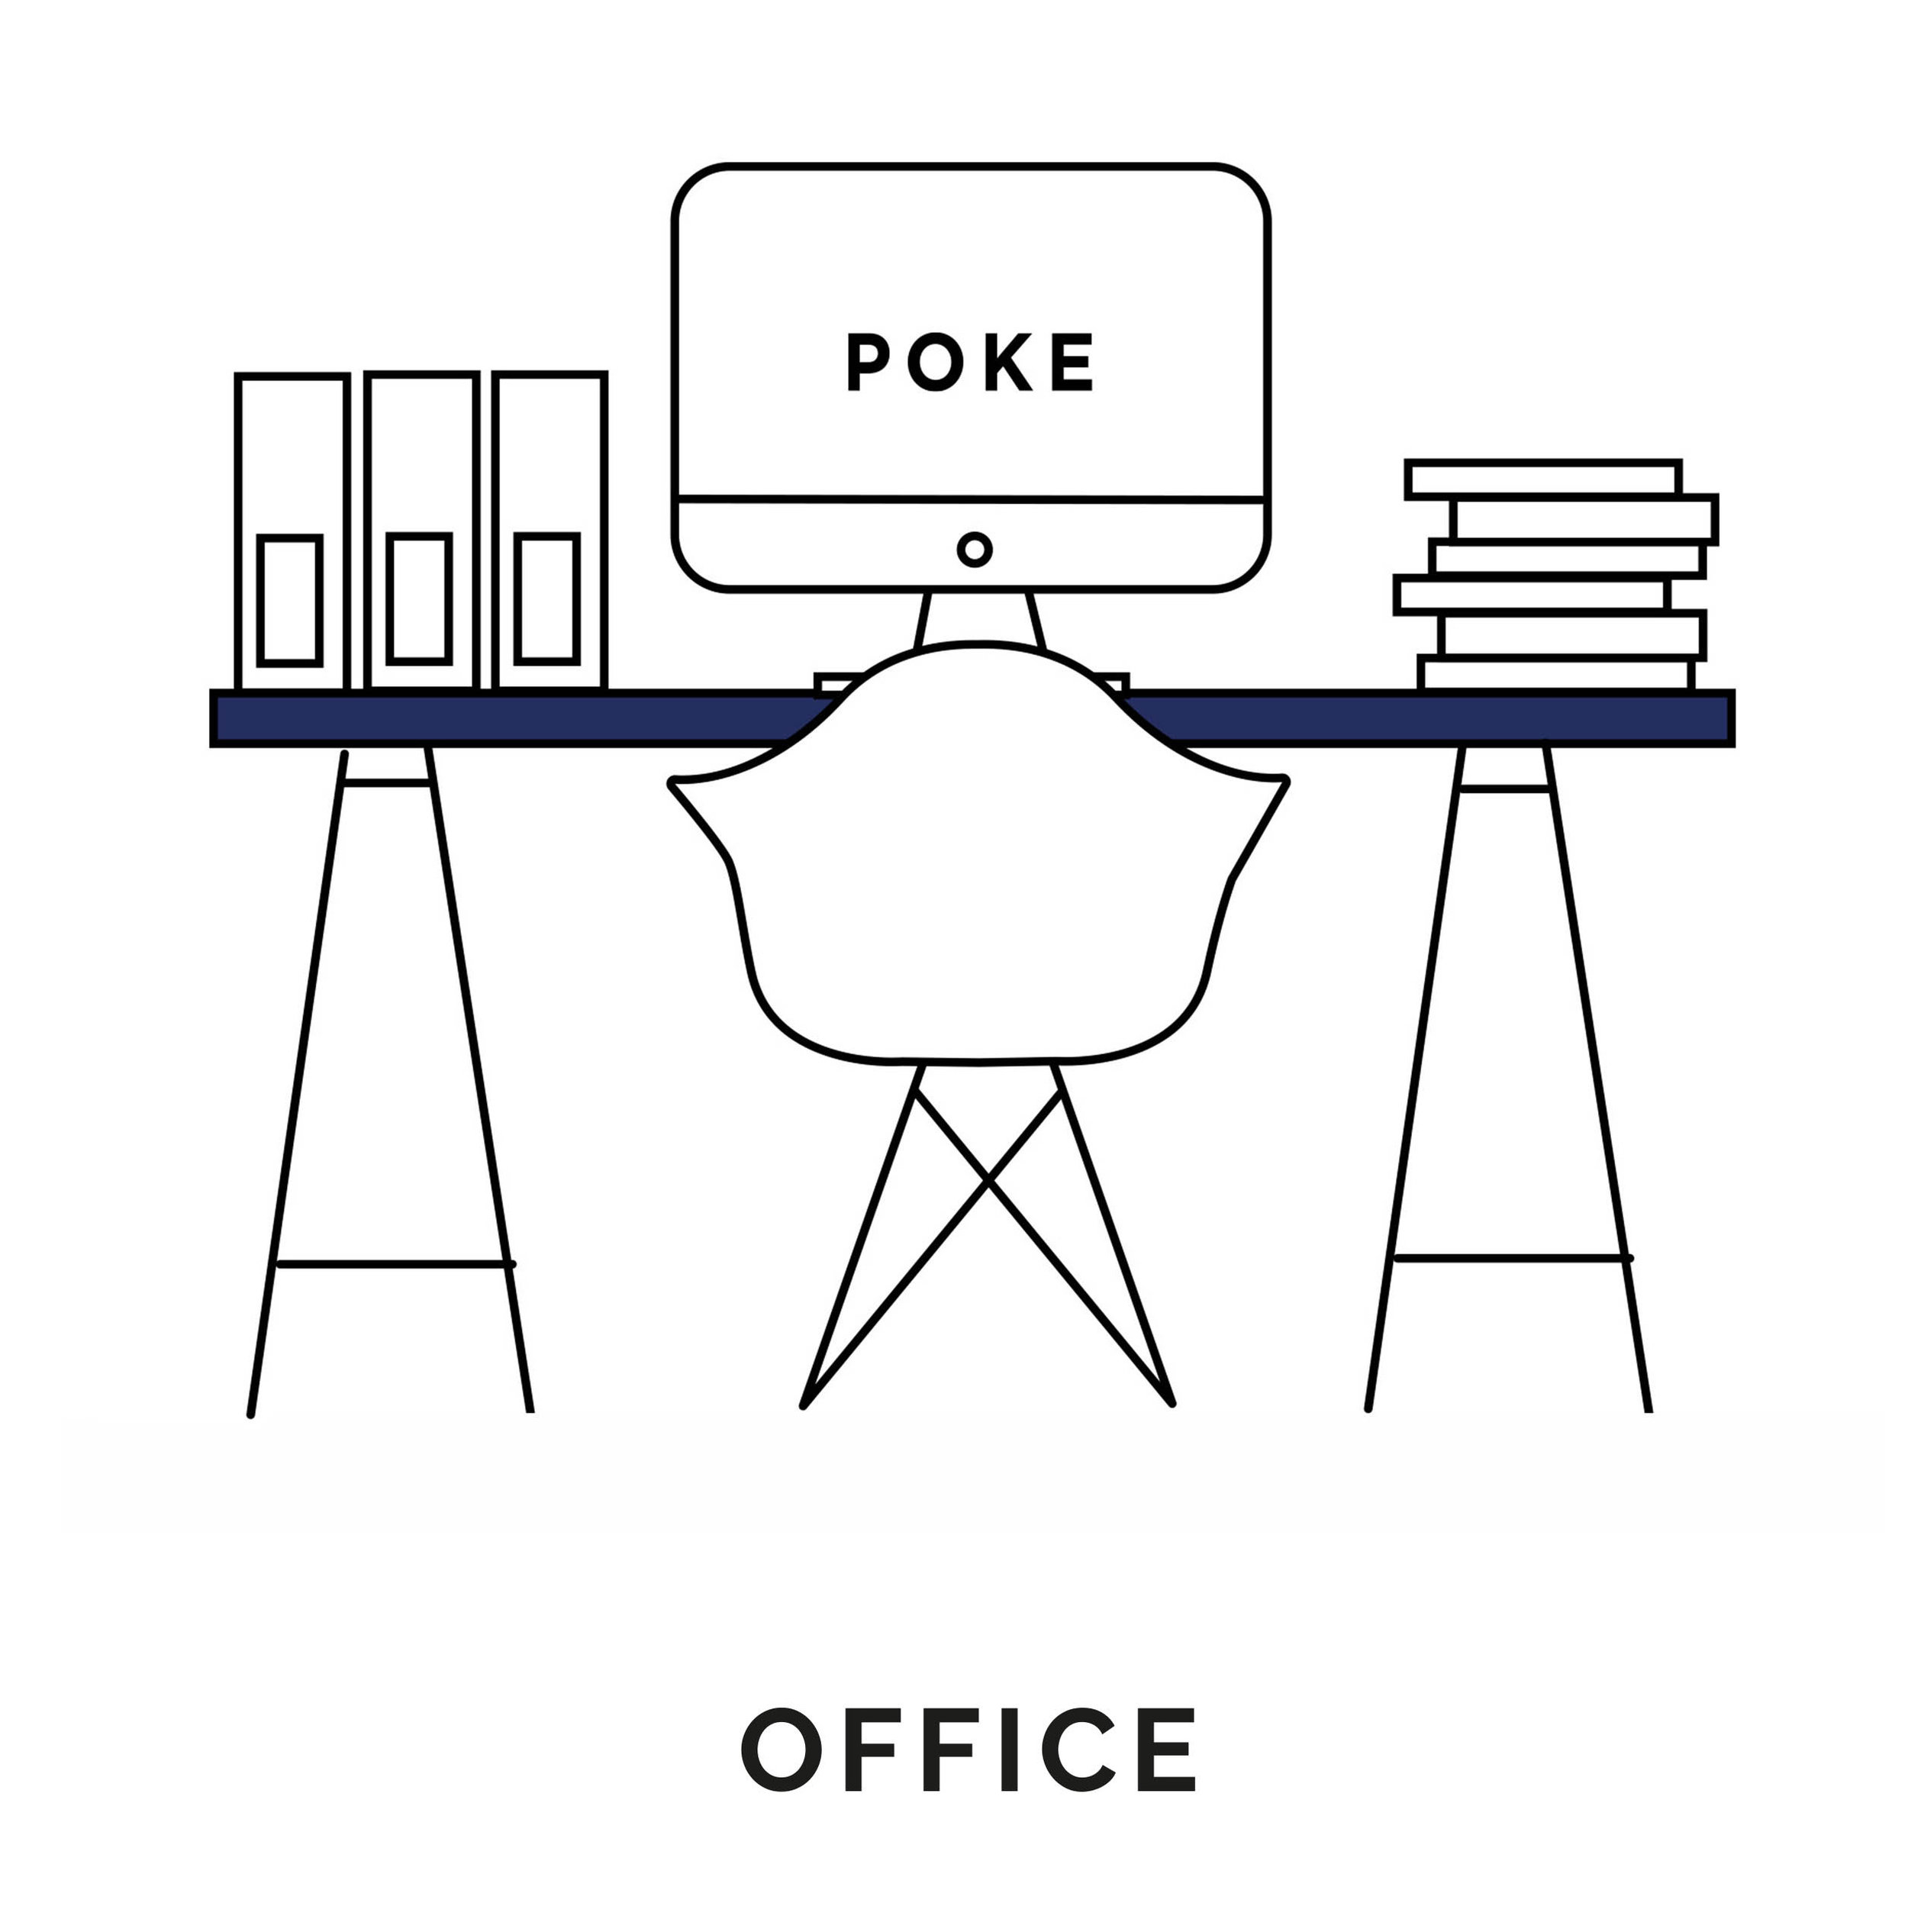 poke_studio_services_office.jpg